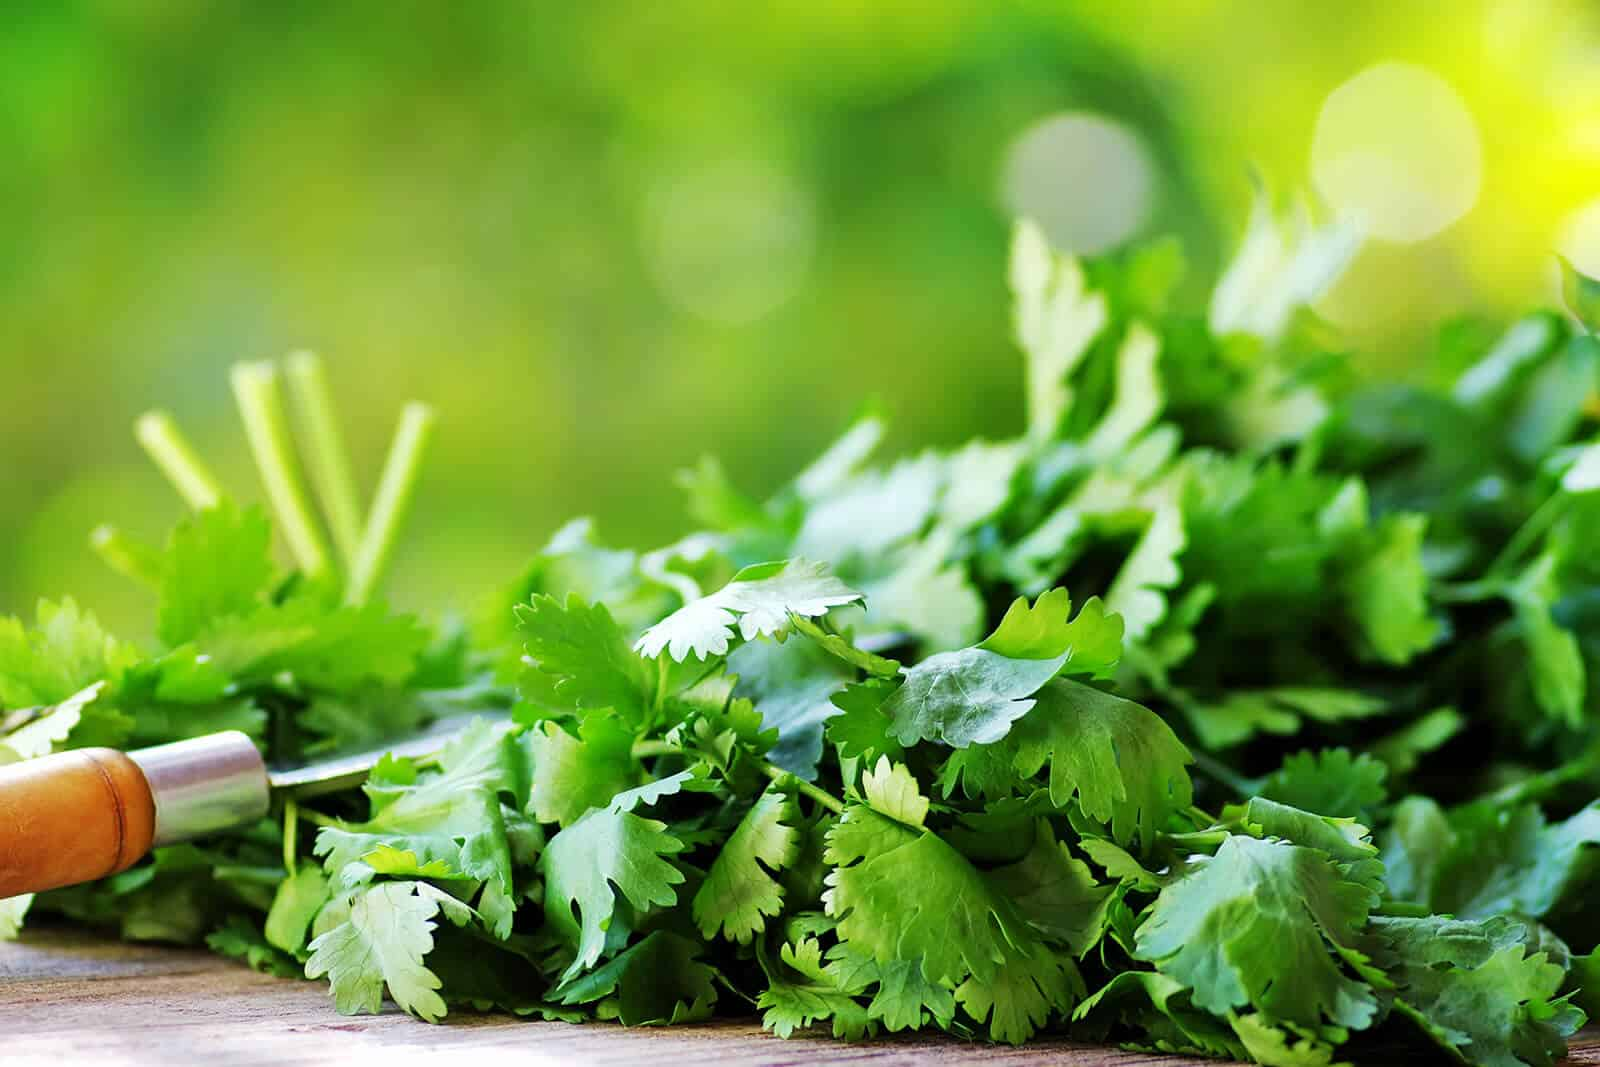 wellnessaromas-aromatherapy-essential-oil_cilantro-benefits-uses